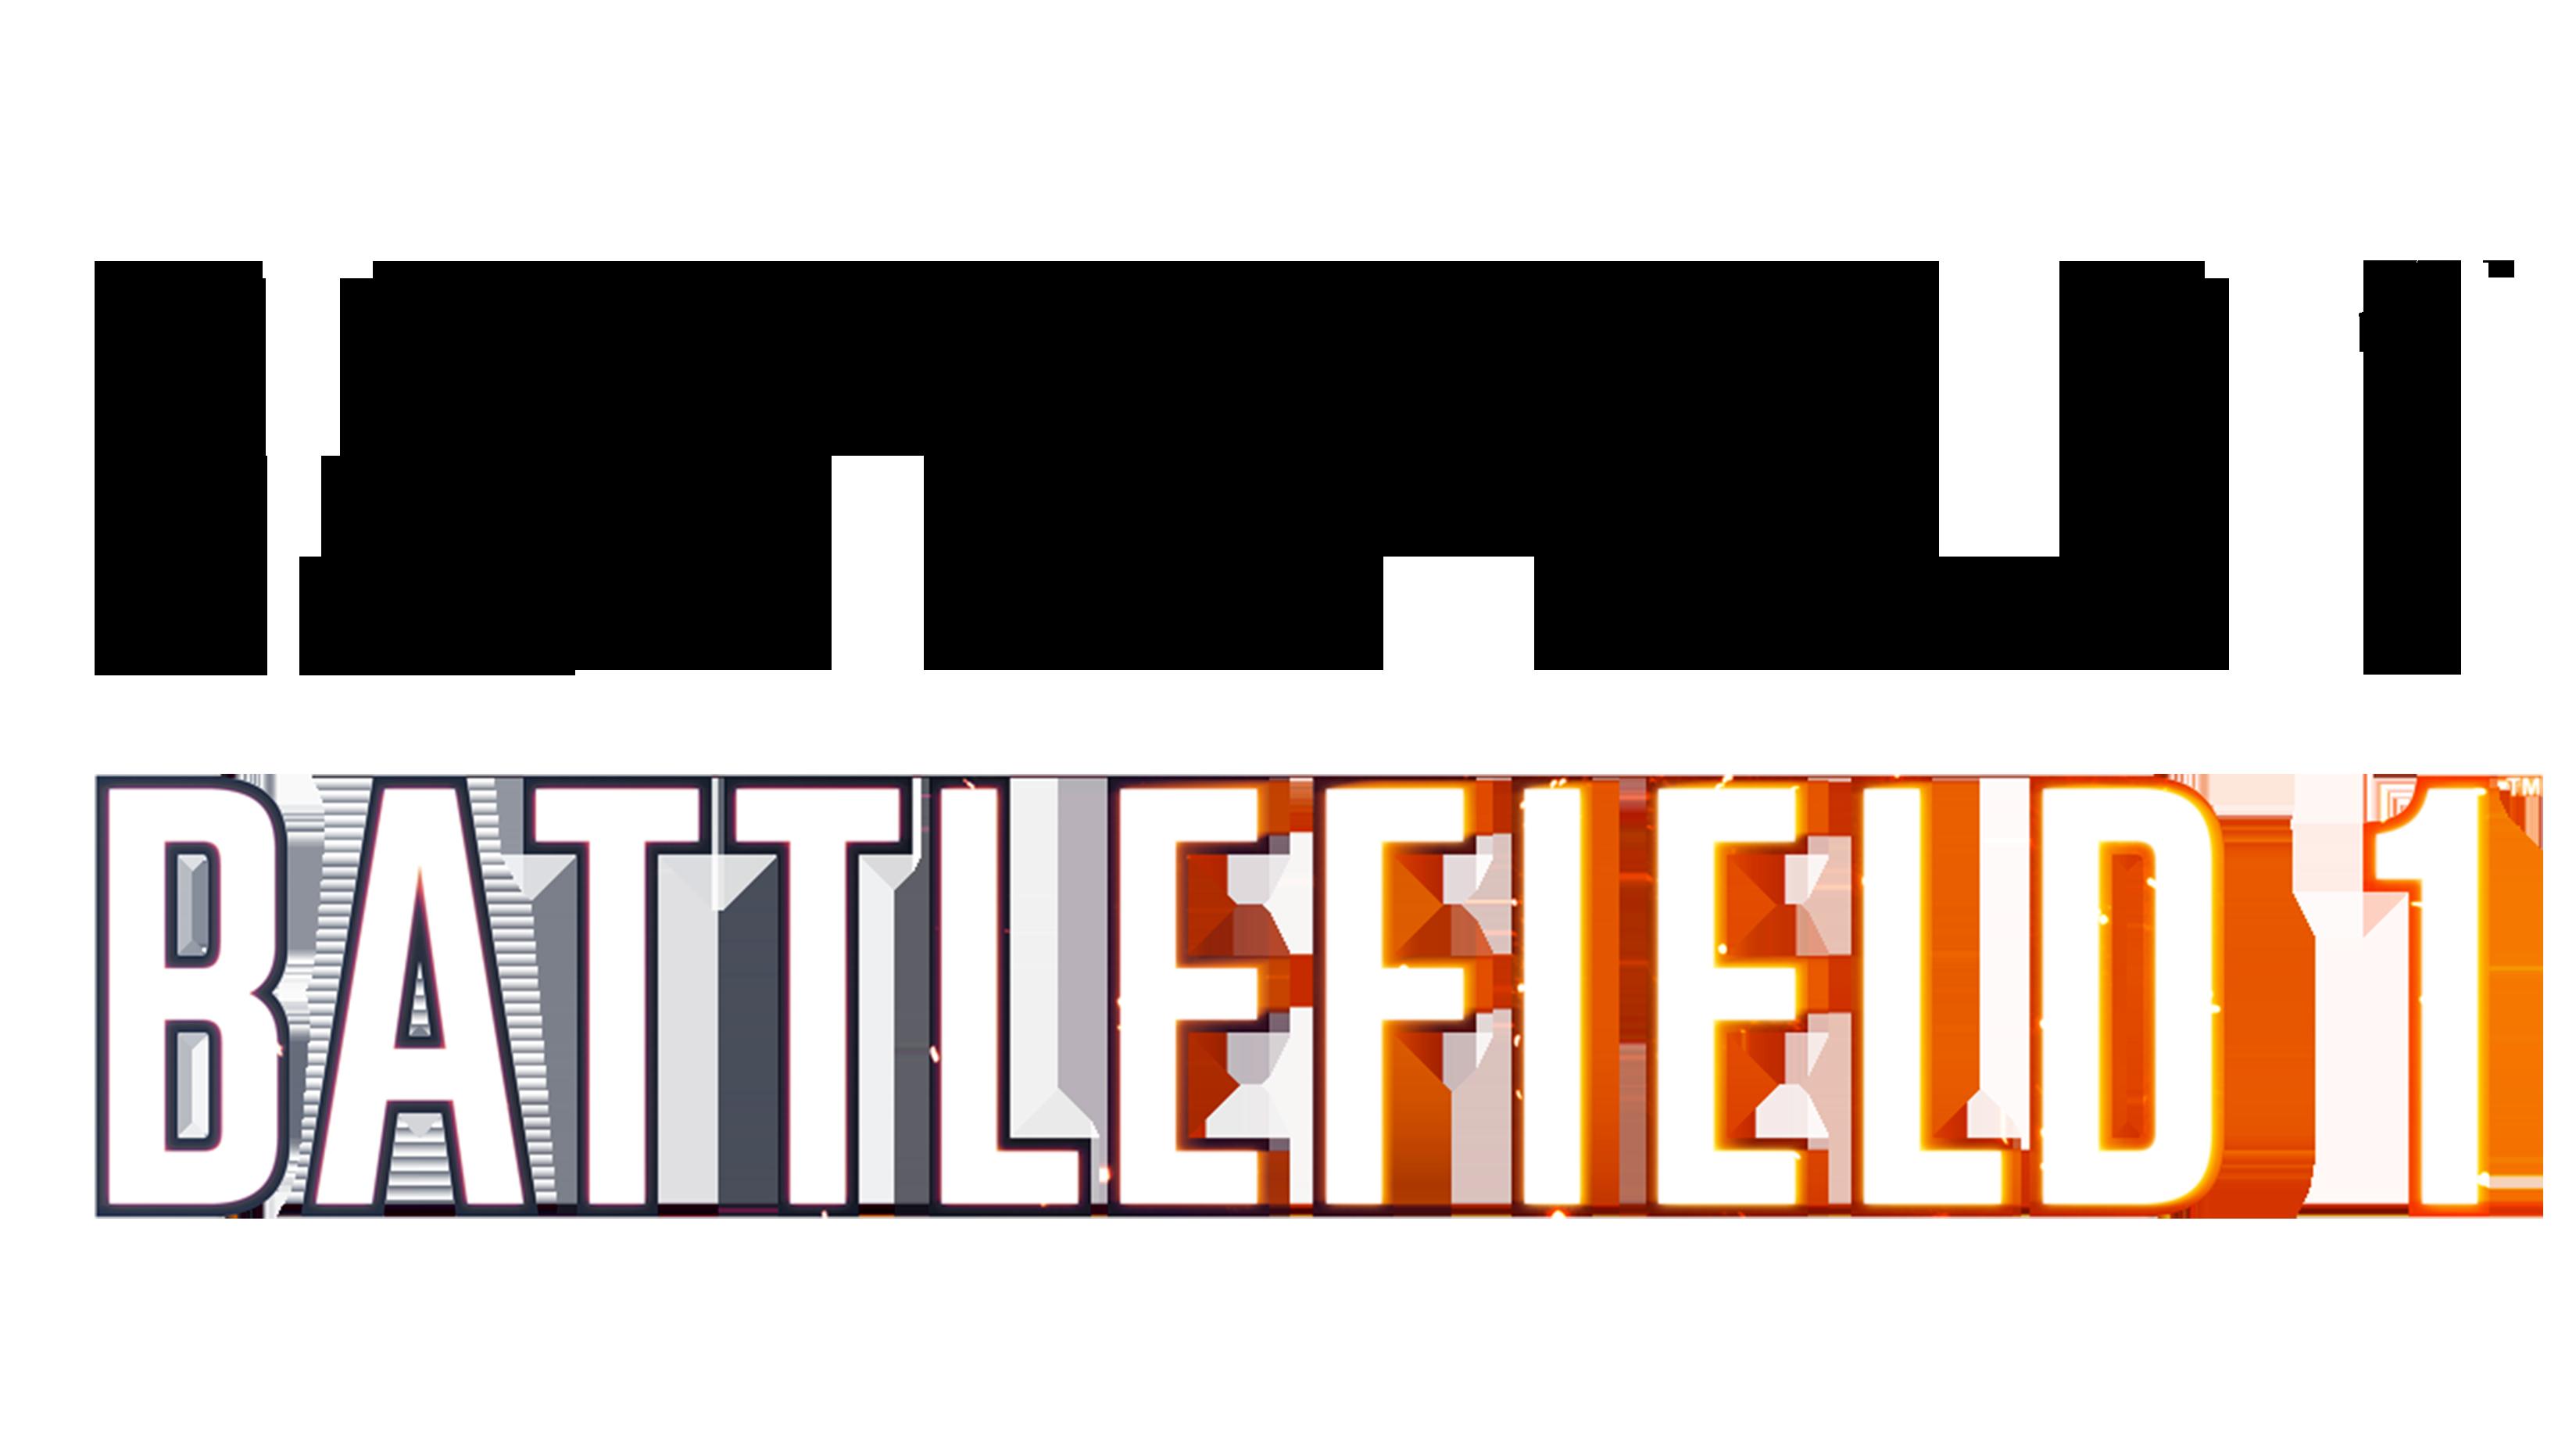 Battlefield 1 Clean logo Transparent